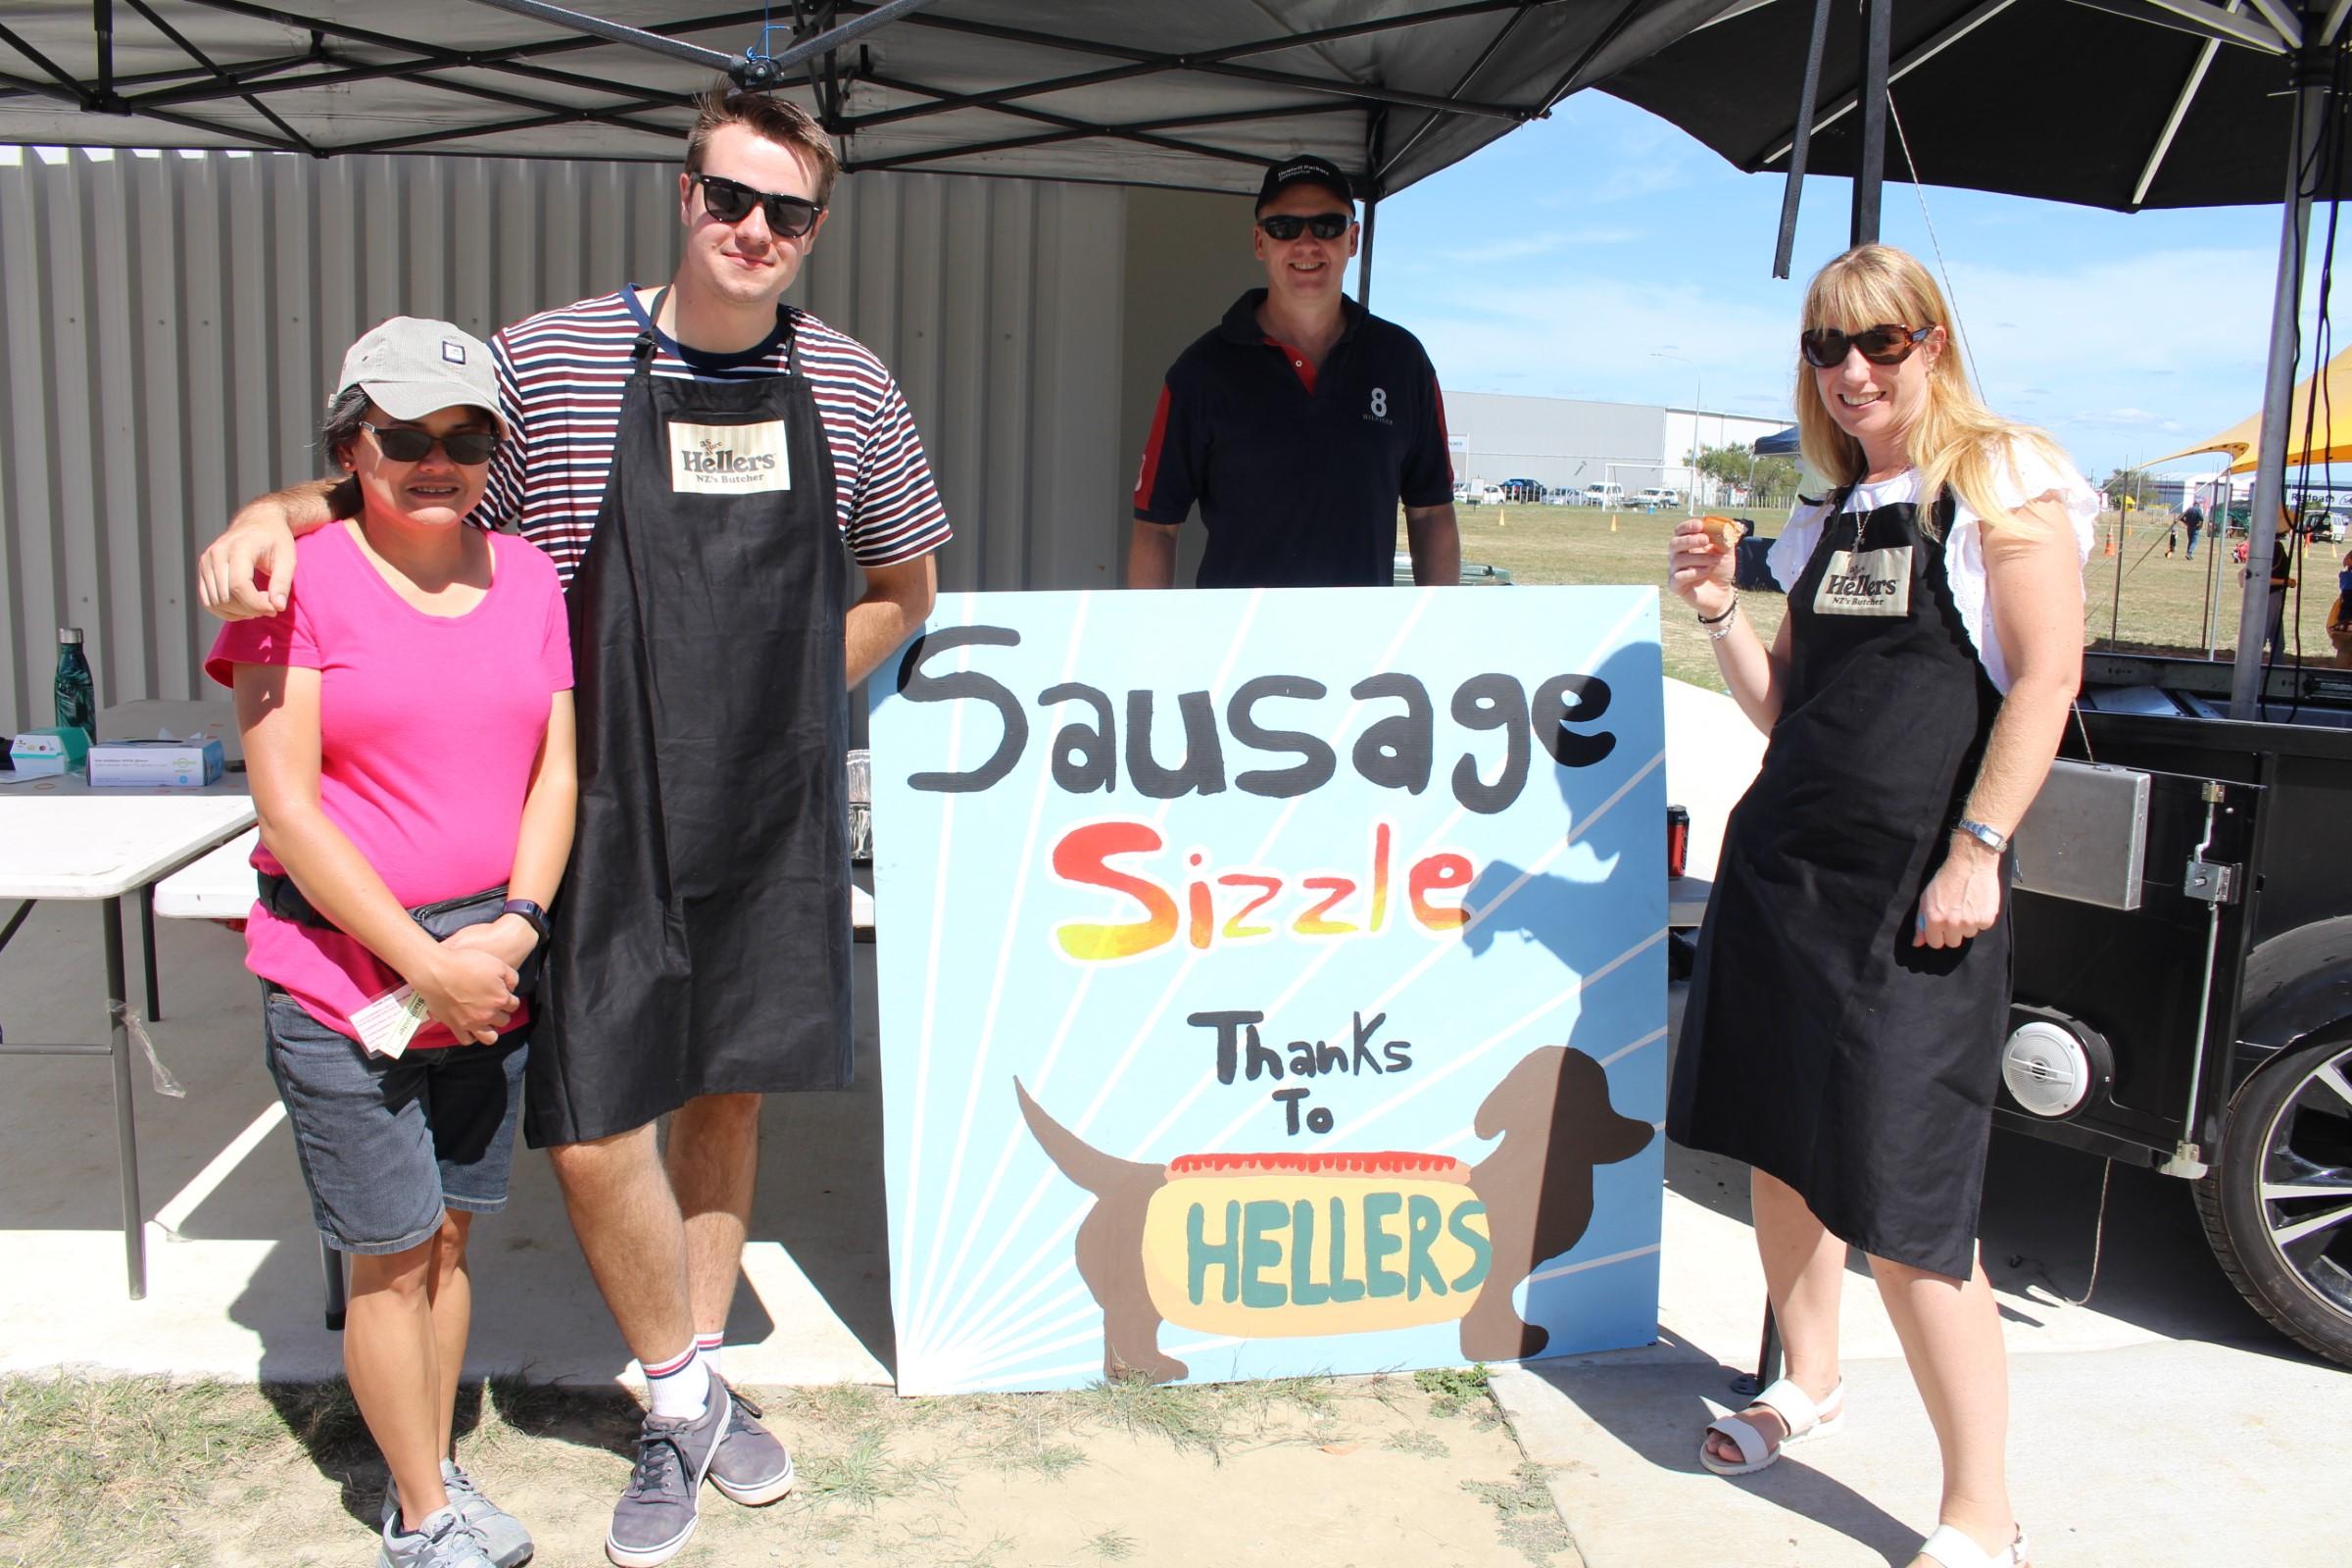 Sausage-Sizzle